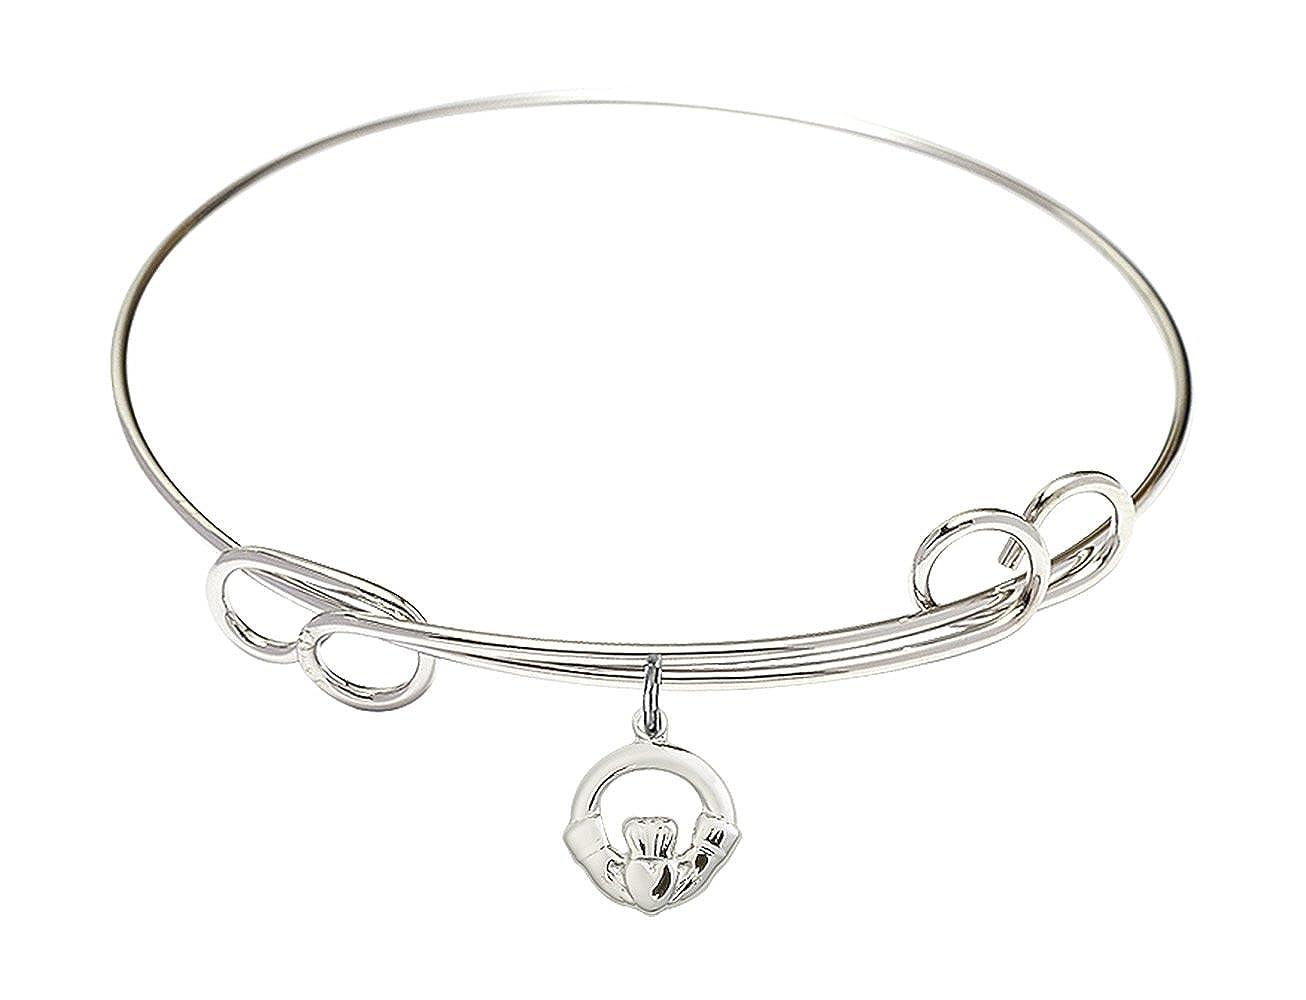 DiamondJewelryNY Double Loop Bangle Bracelet with a Claddagh Charm.